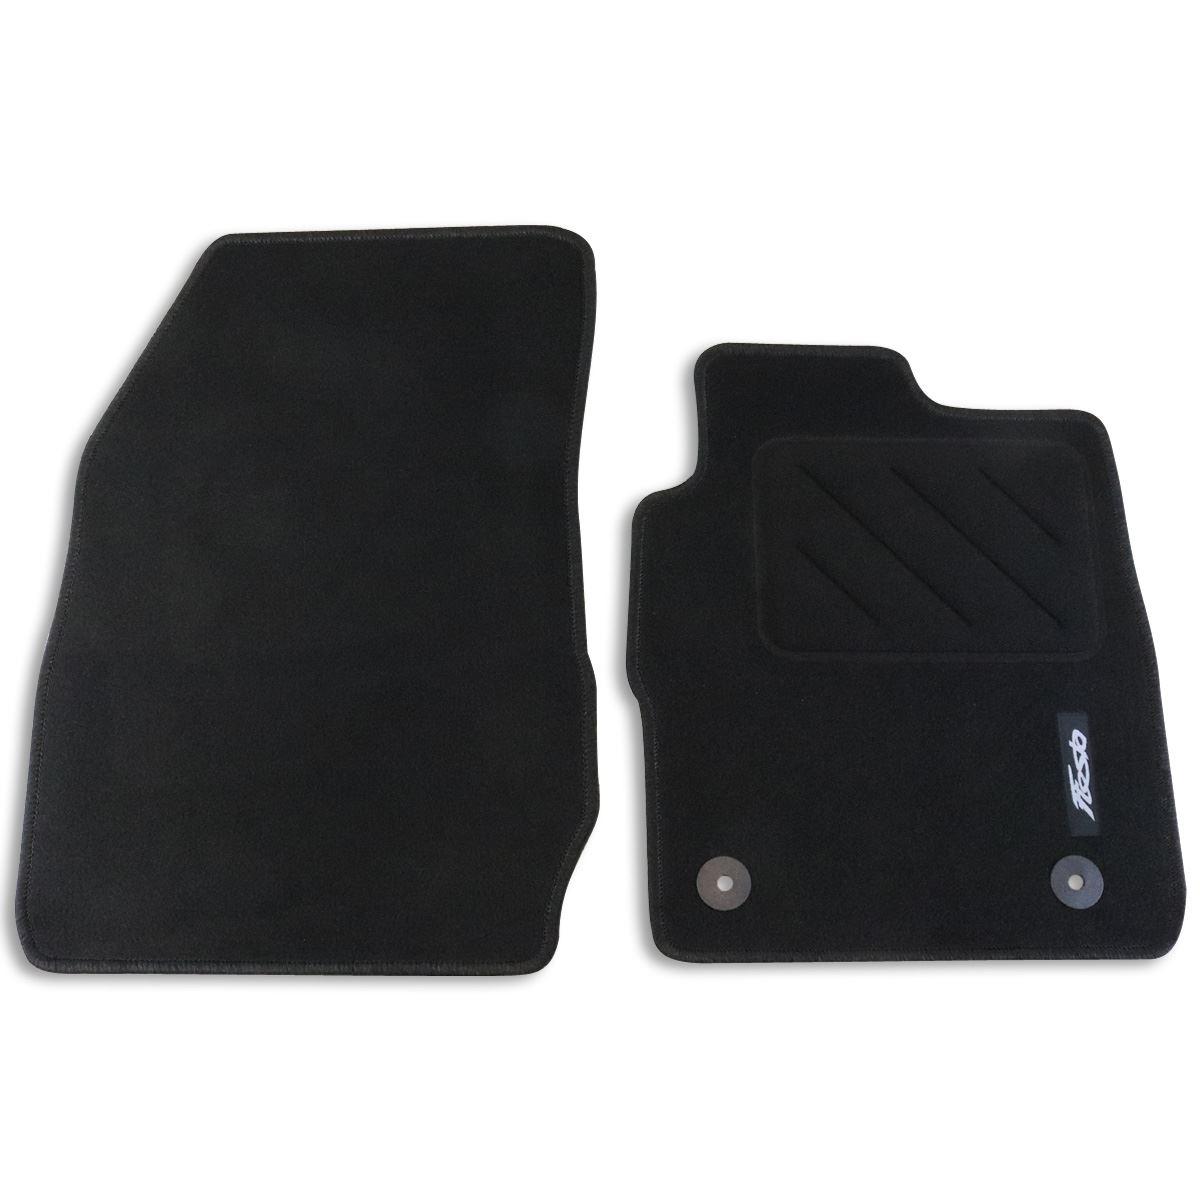 BRAND NEW OEM ACCESSORY BLACK FLOOR CONTOUR CARPET MAT KIT 2012-2017 FORD FOCUS